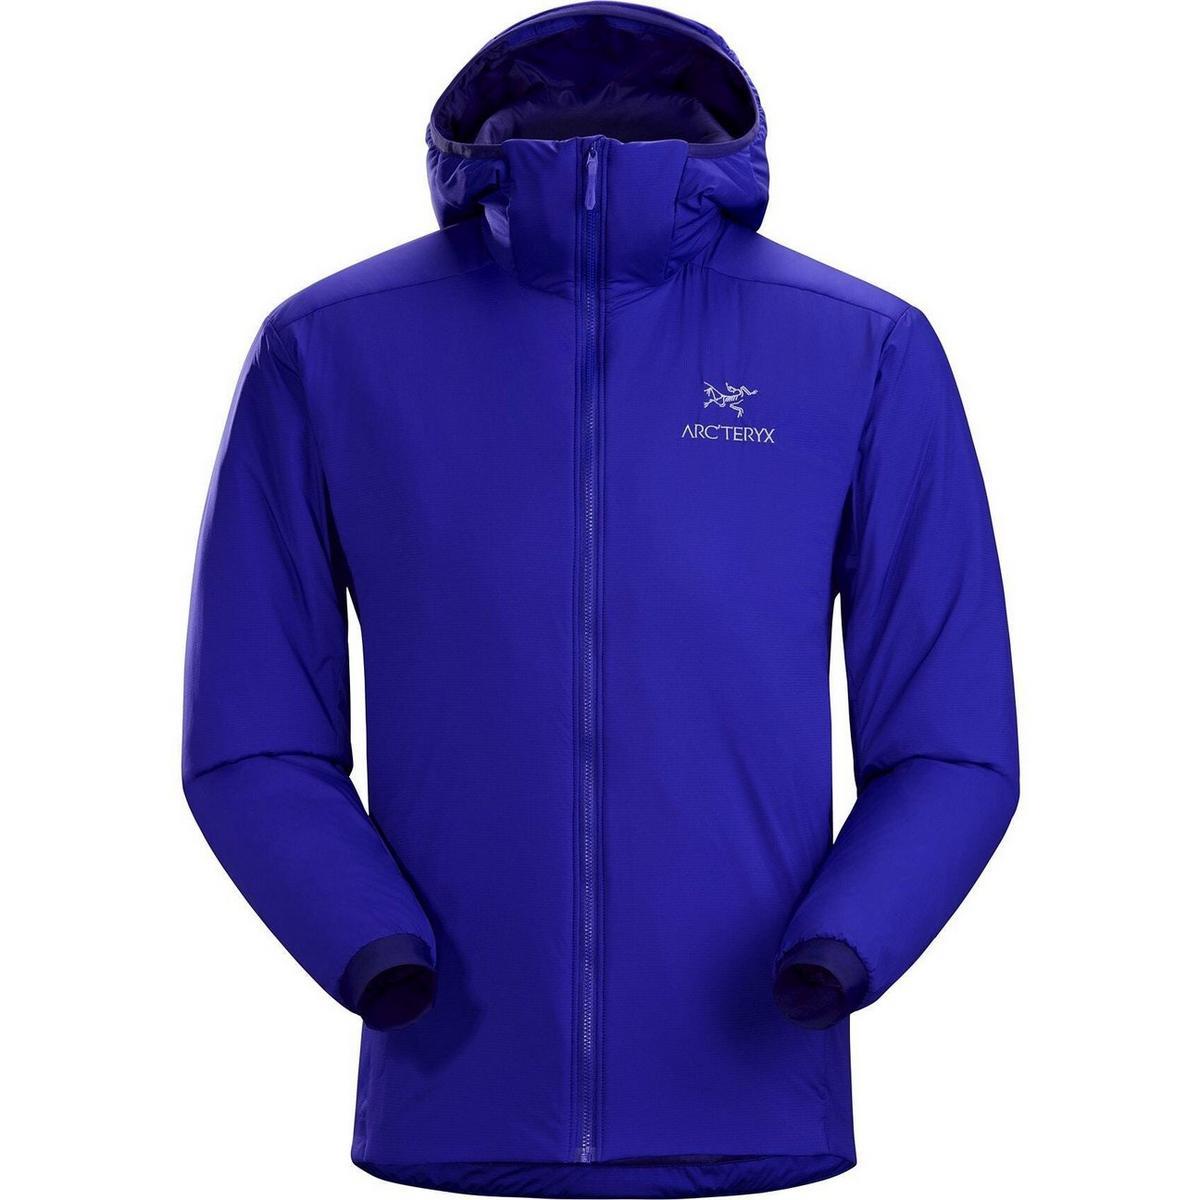 Arcteryx Men's Arc'teryx Atom LT Hoody - Purple